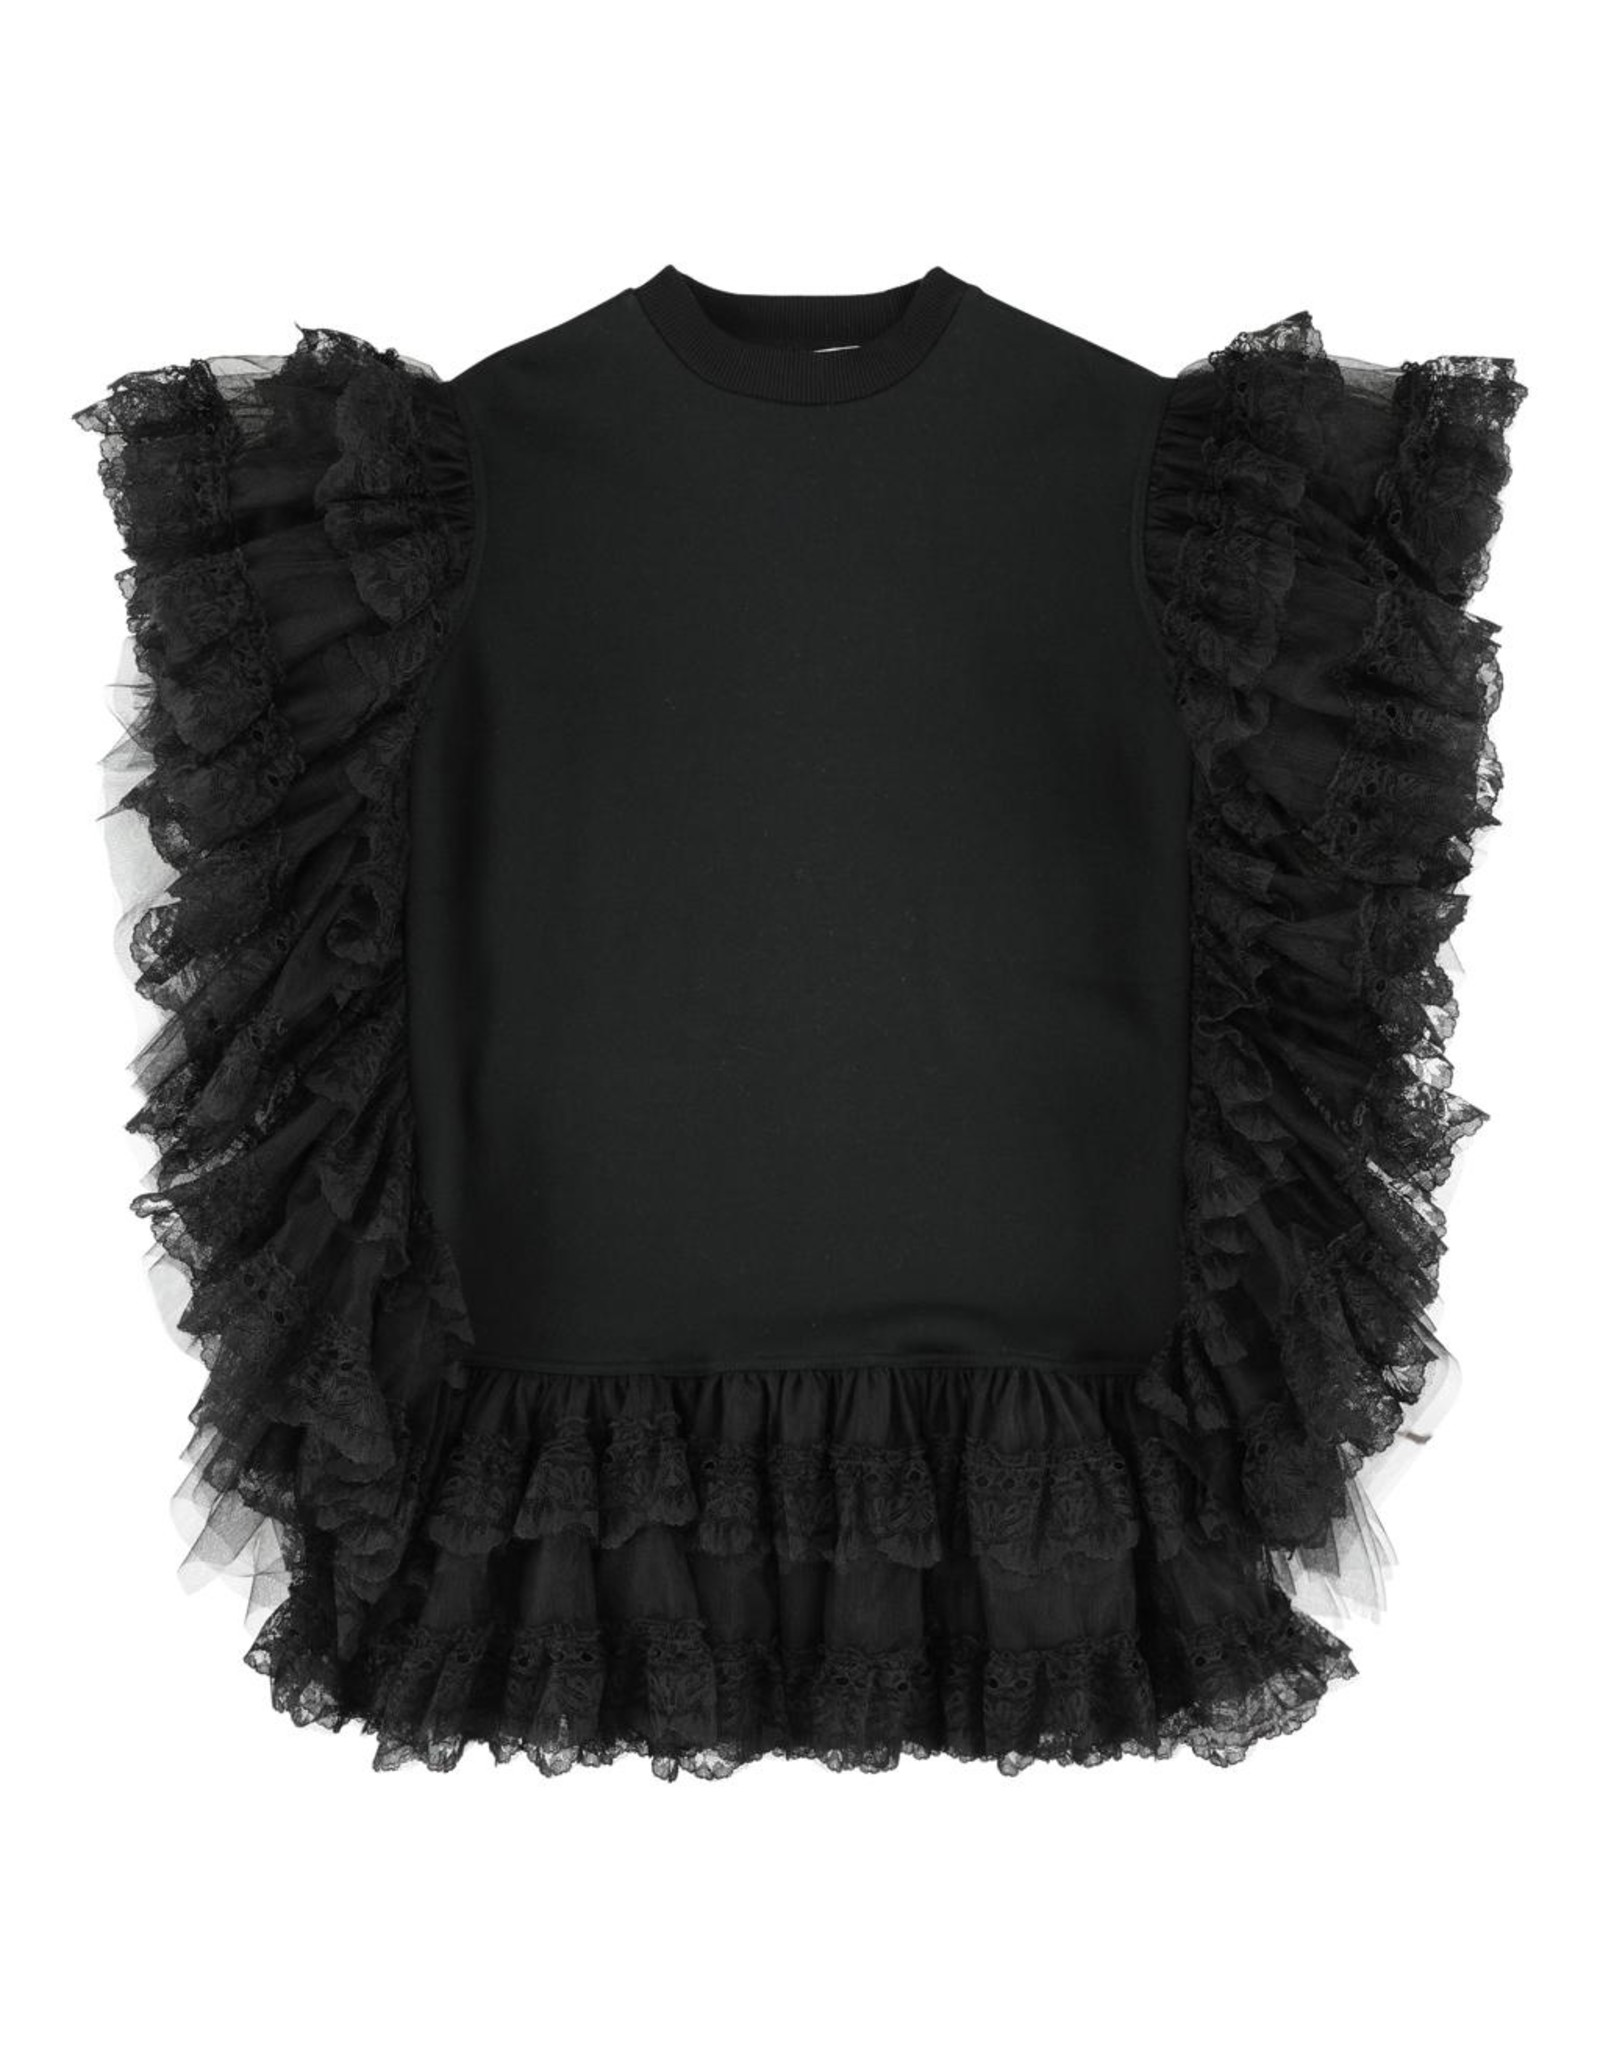 CRLNBSMNS PS21 4037457 ruffled dress black